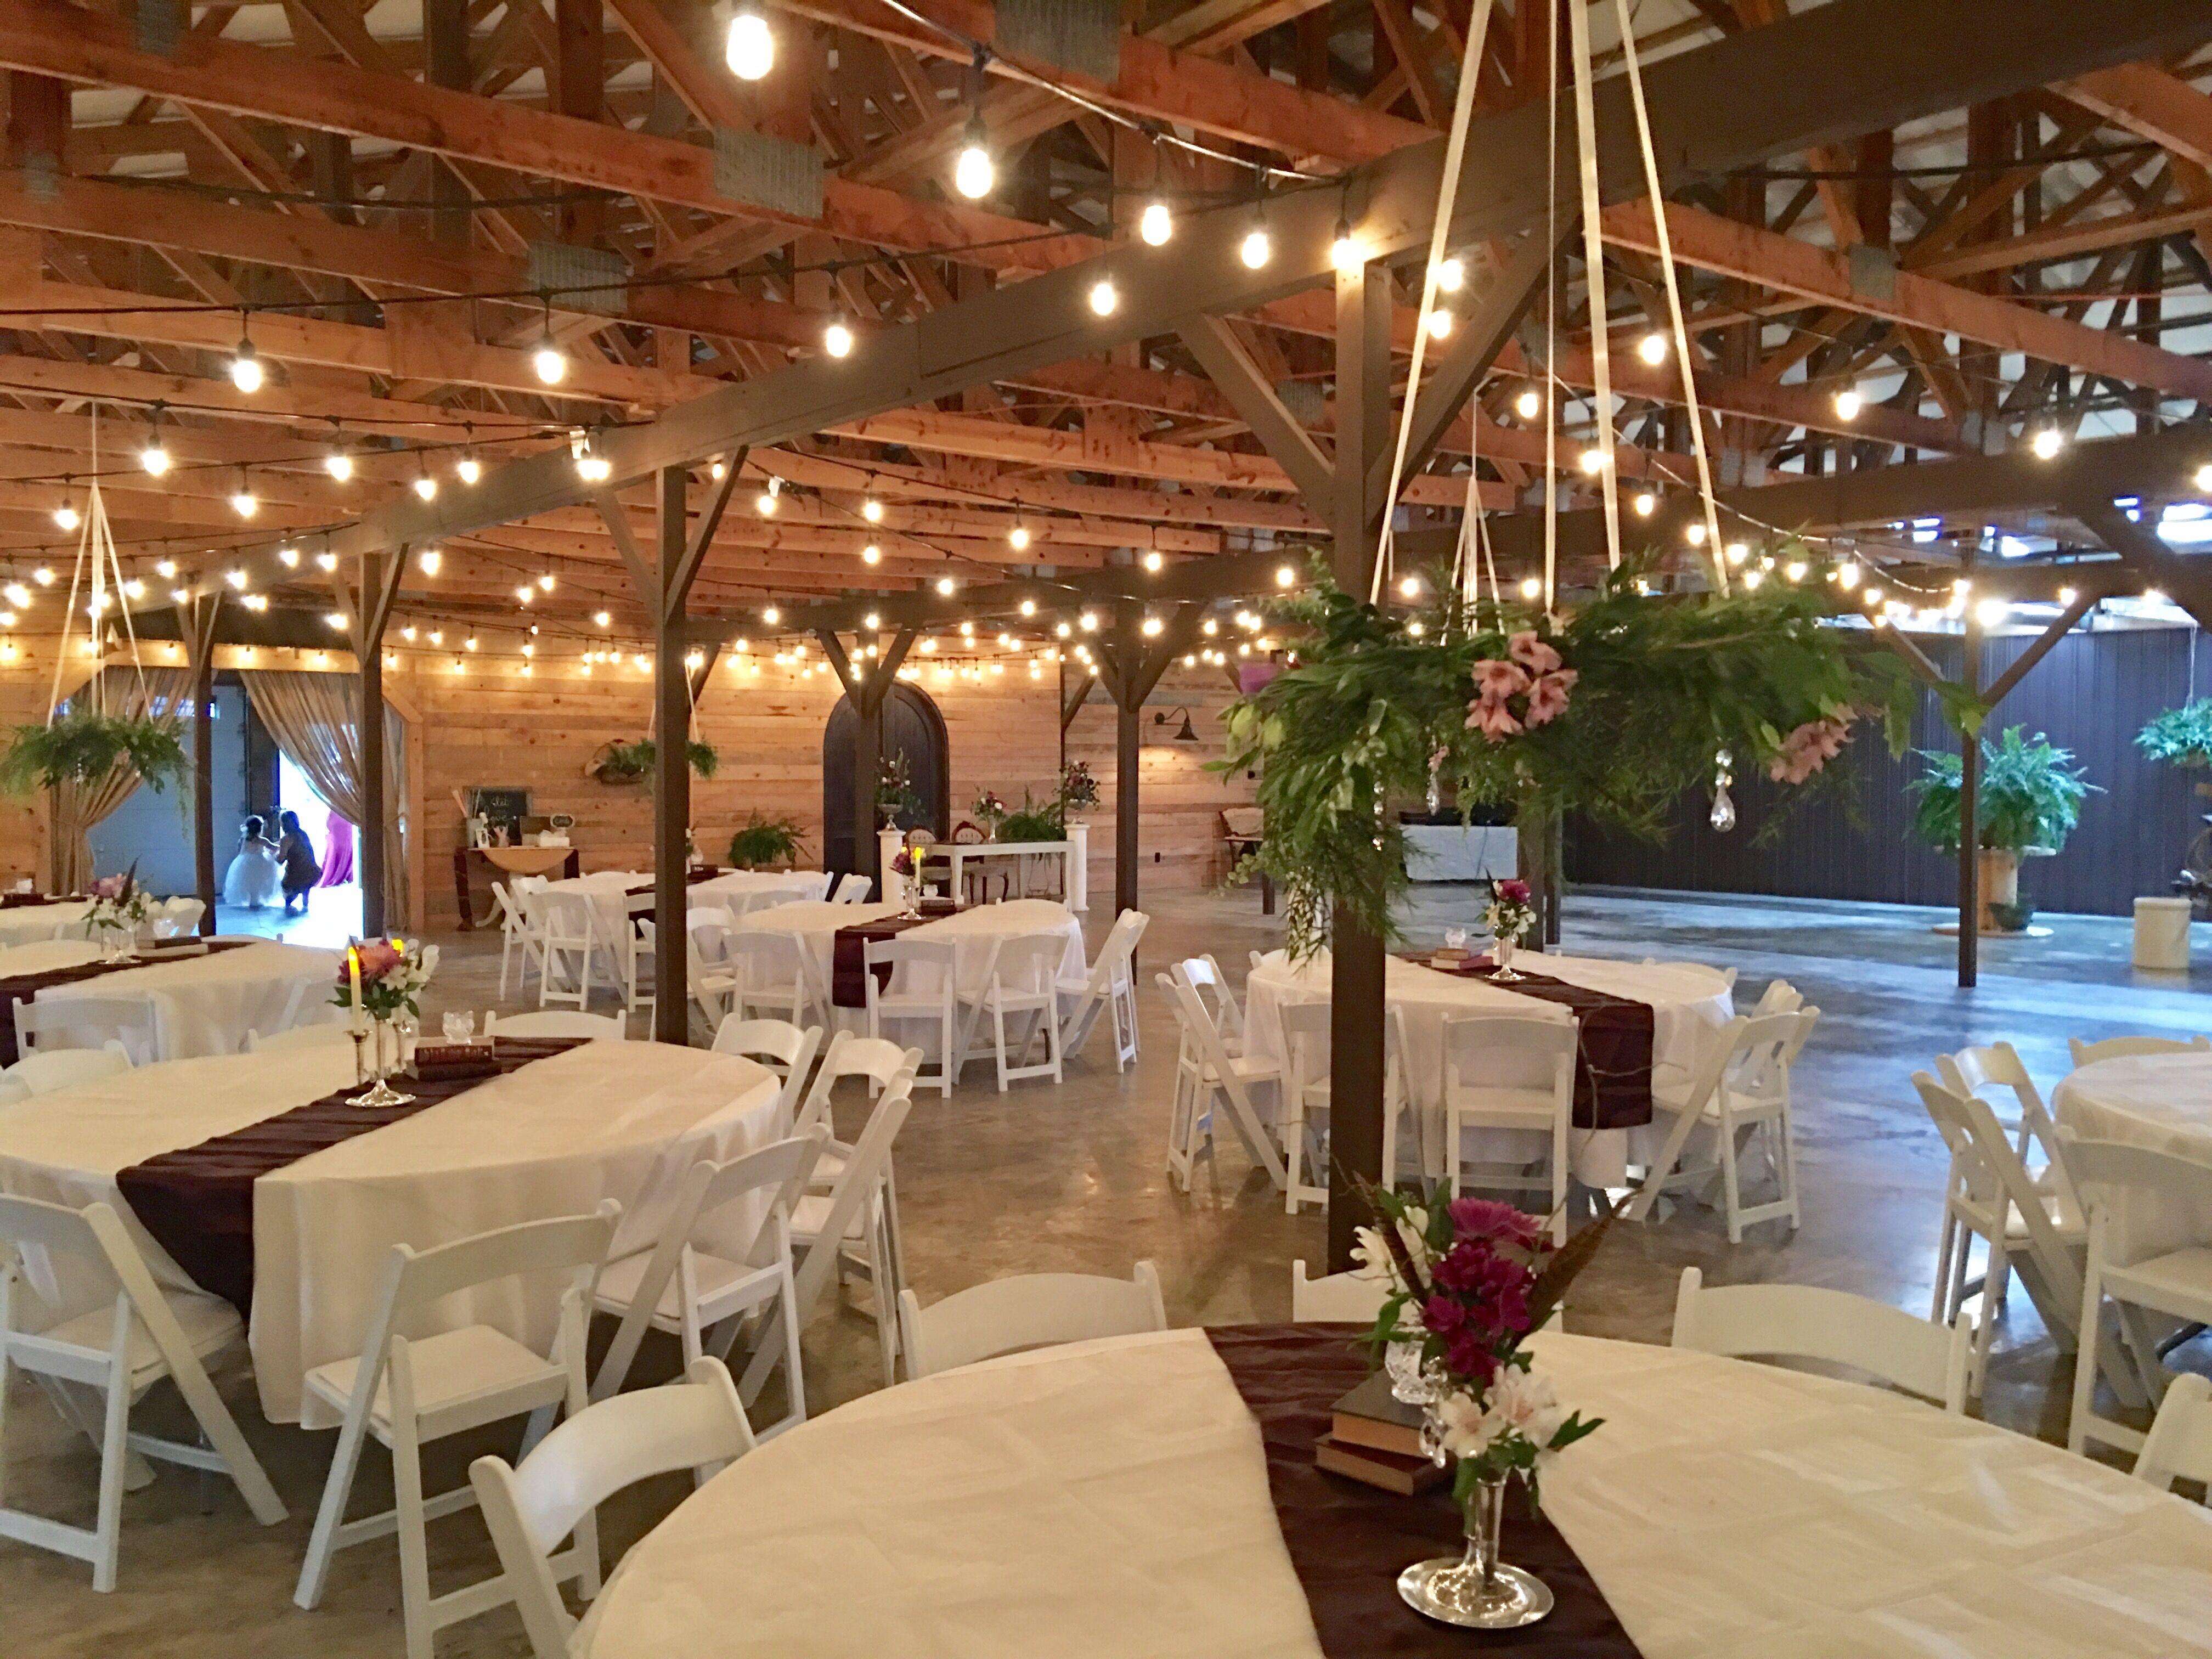 88 Affordable Wedding Venues In Birmingham Al Affordable Wedding Venues In Birmingham Al